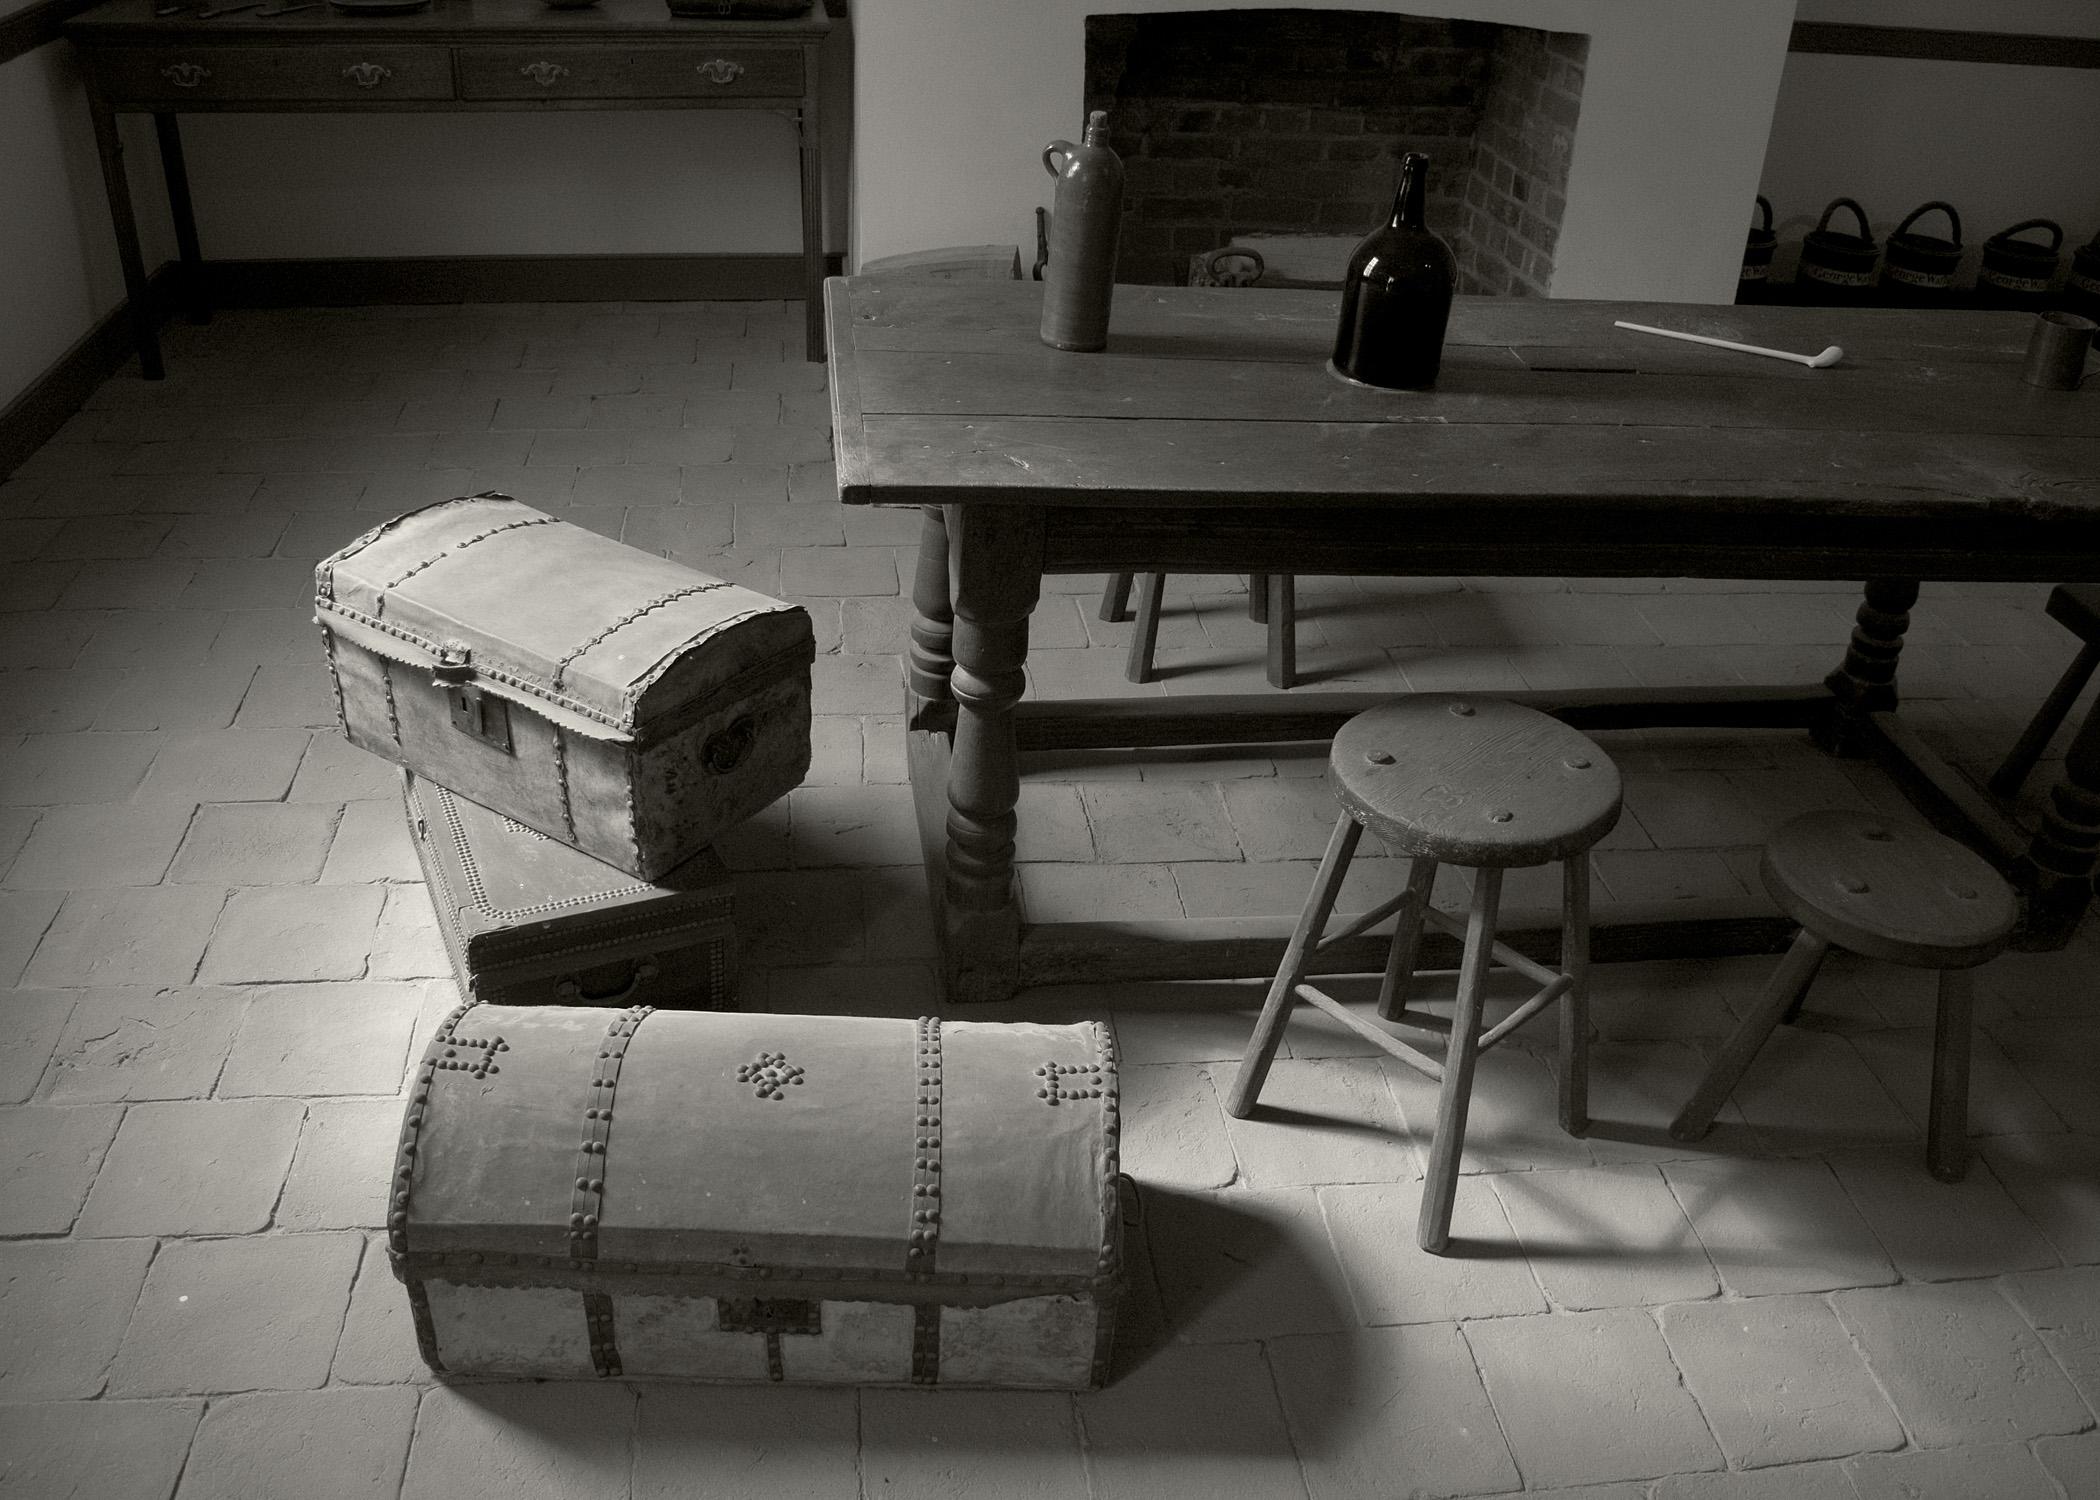 Table Wood White Floor Furniture Room Monochrome Interior Design History Historical